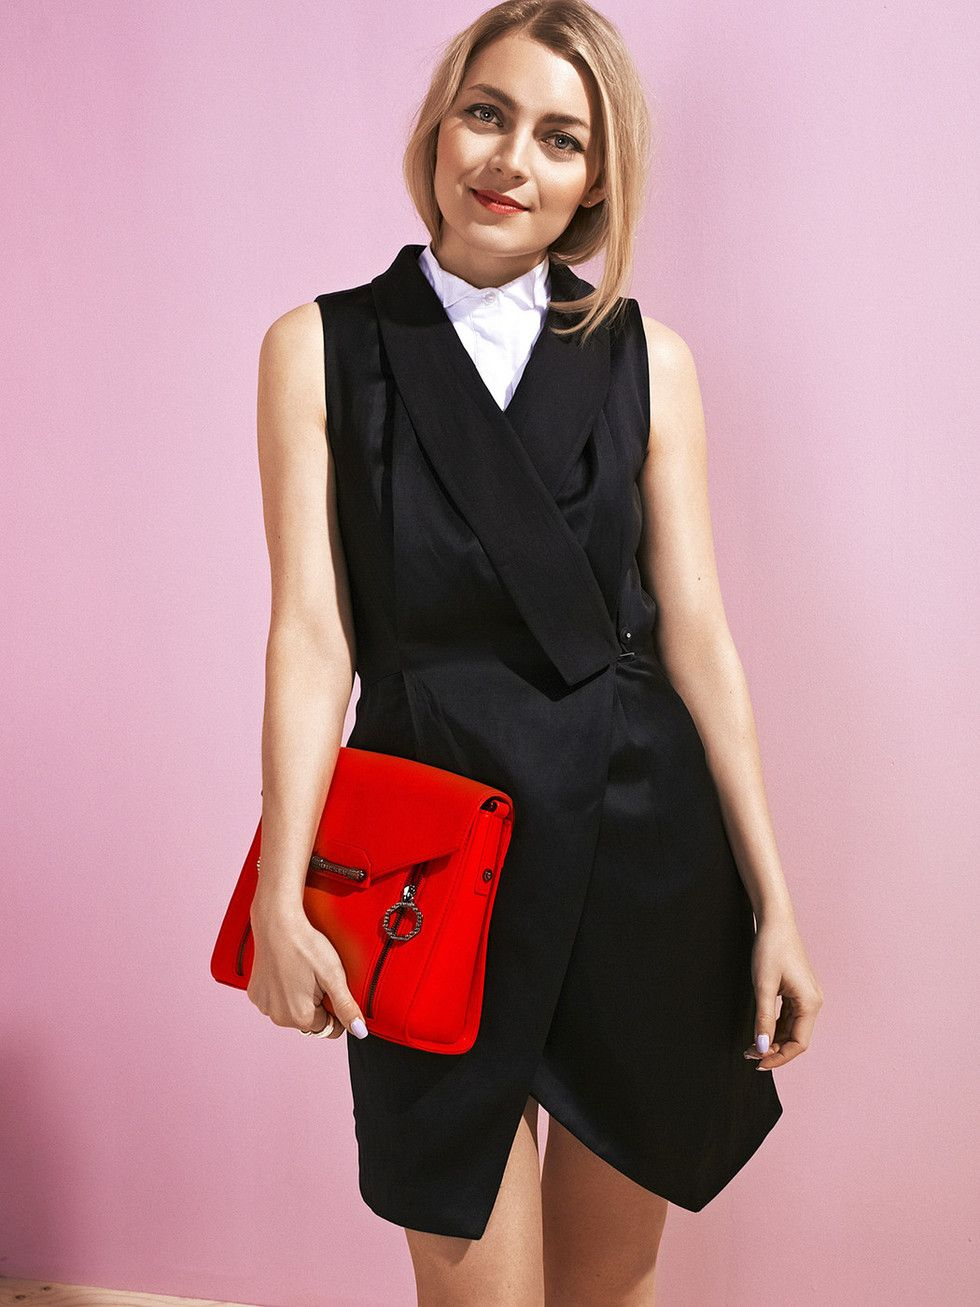 Vest dress | Trendi Magazine April 2015, Photo: Sebastian Johansson, Style: Suvi Poutiainen, Model: Jenni Rotonen | Pupulandia